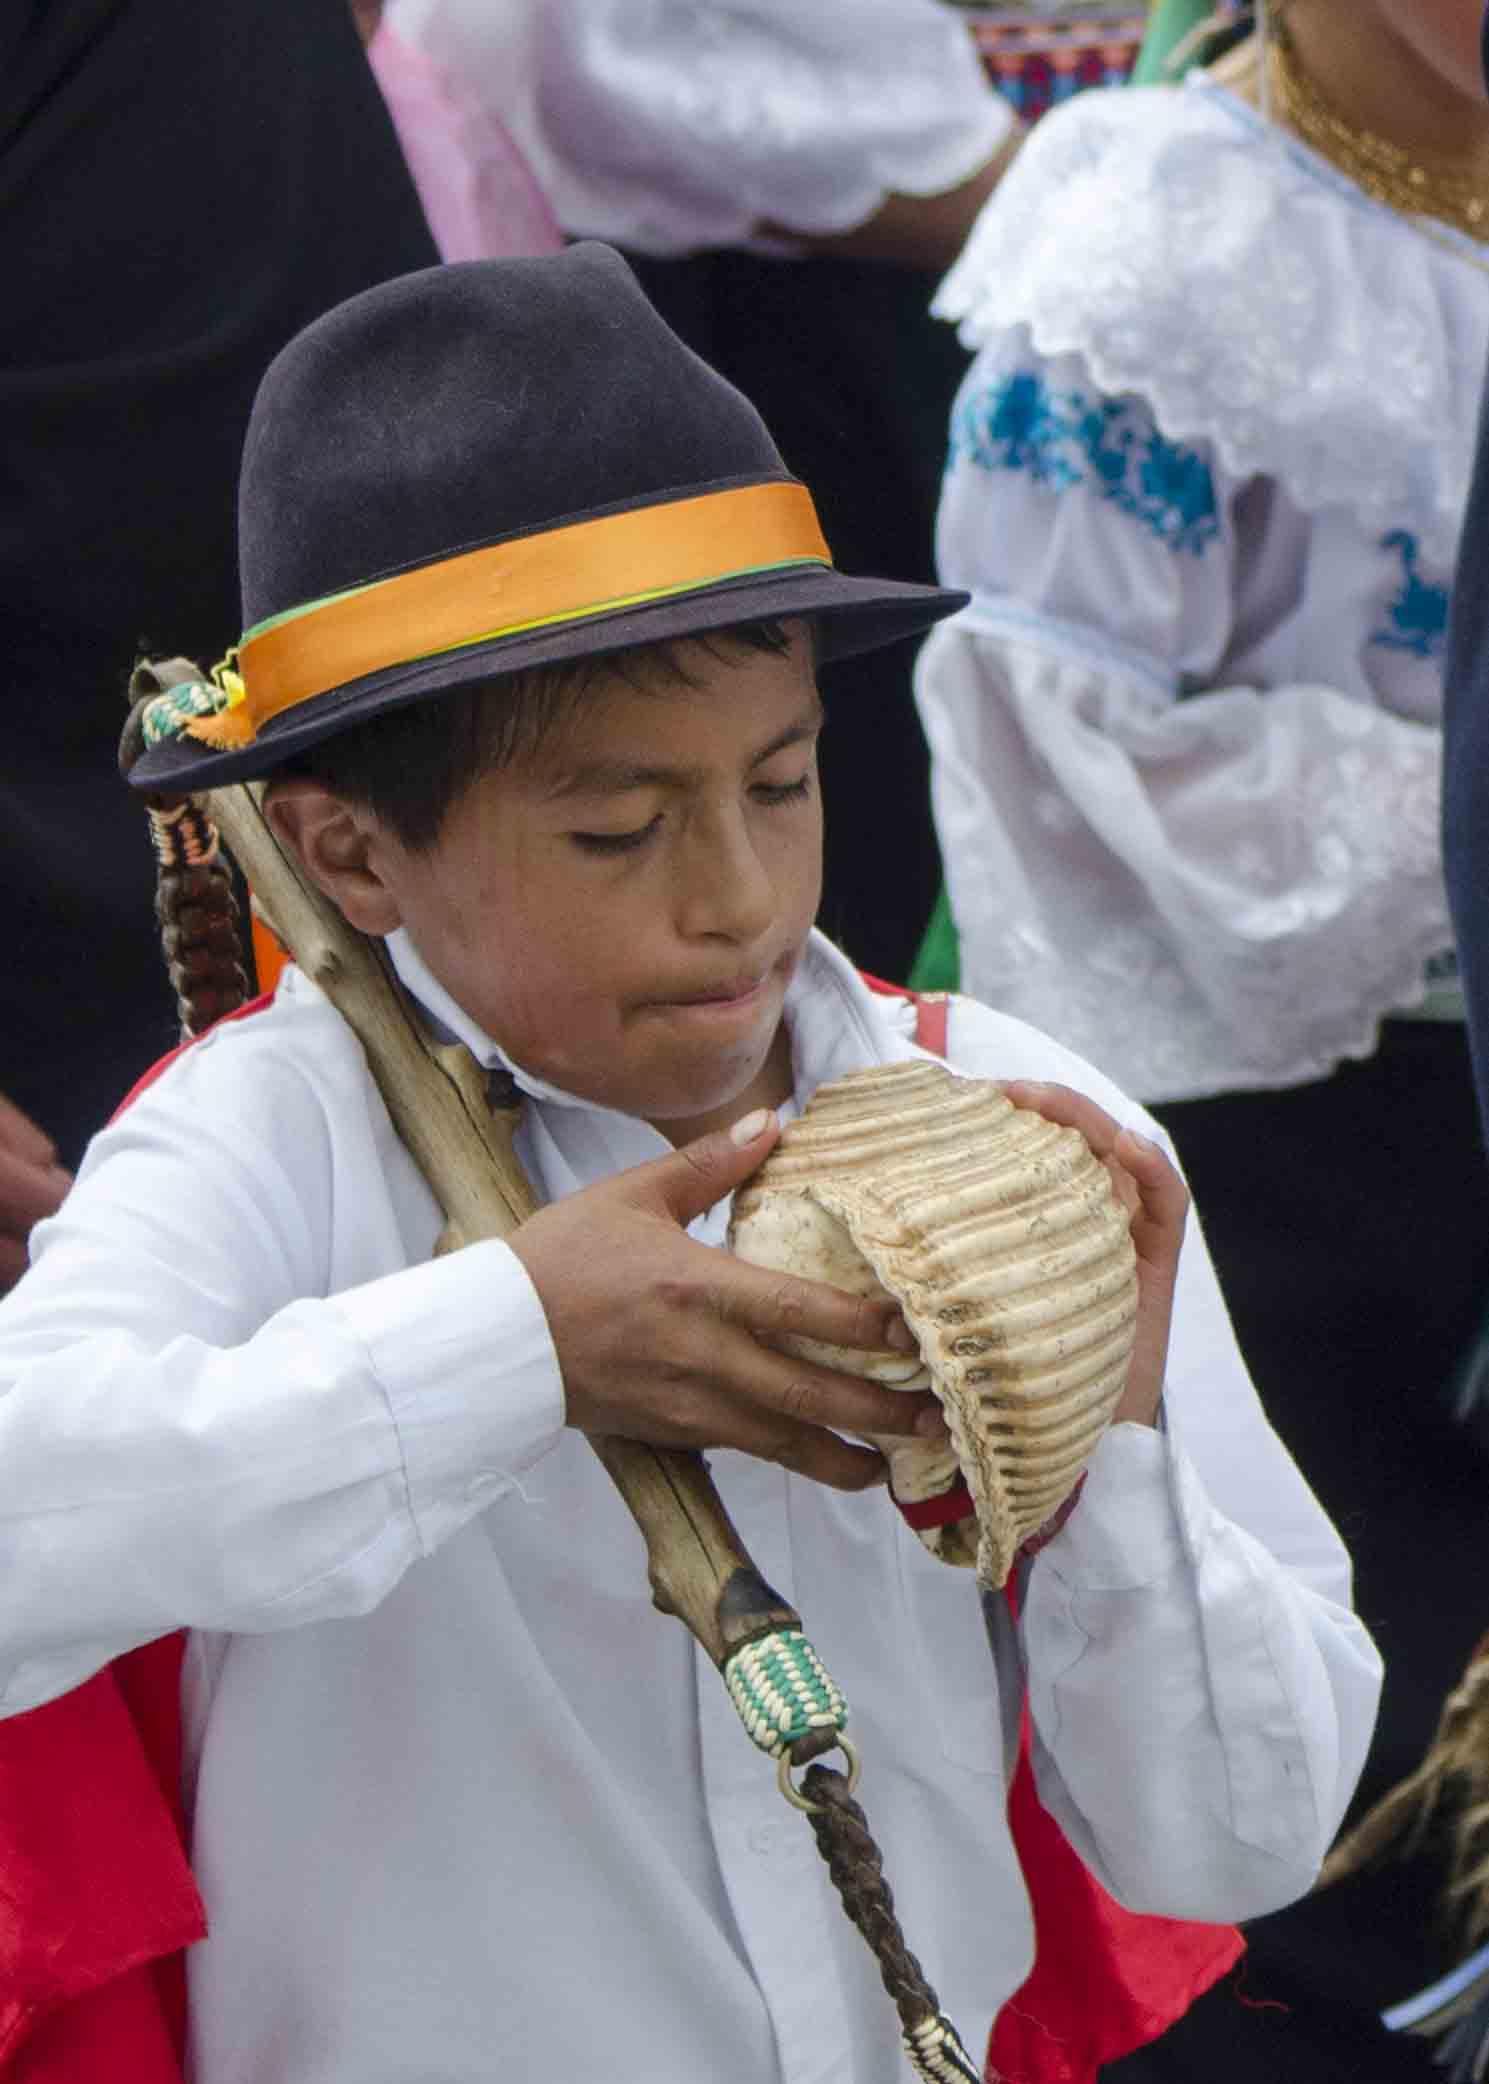 Preparing to Blow the Conch Shell, Inti Raymi, Parade of Schools, Cotachi, Ecuador